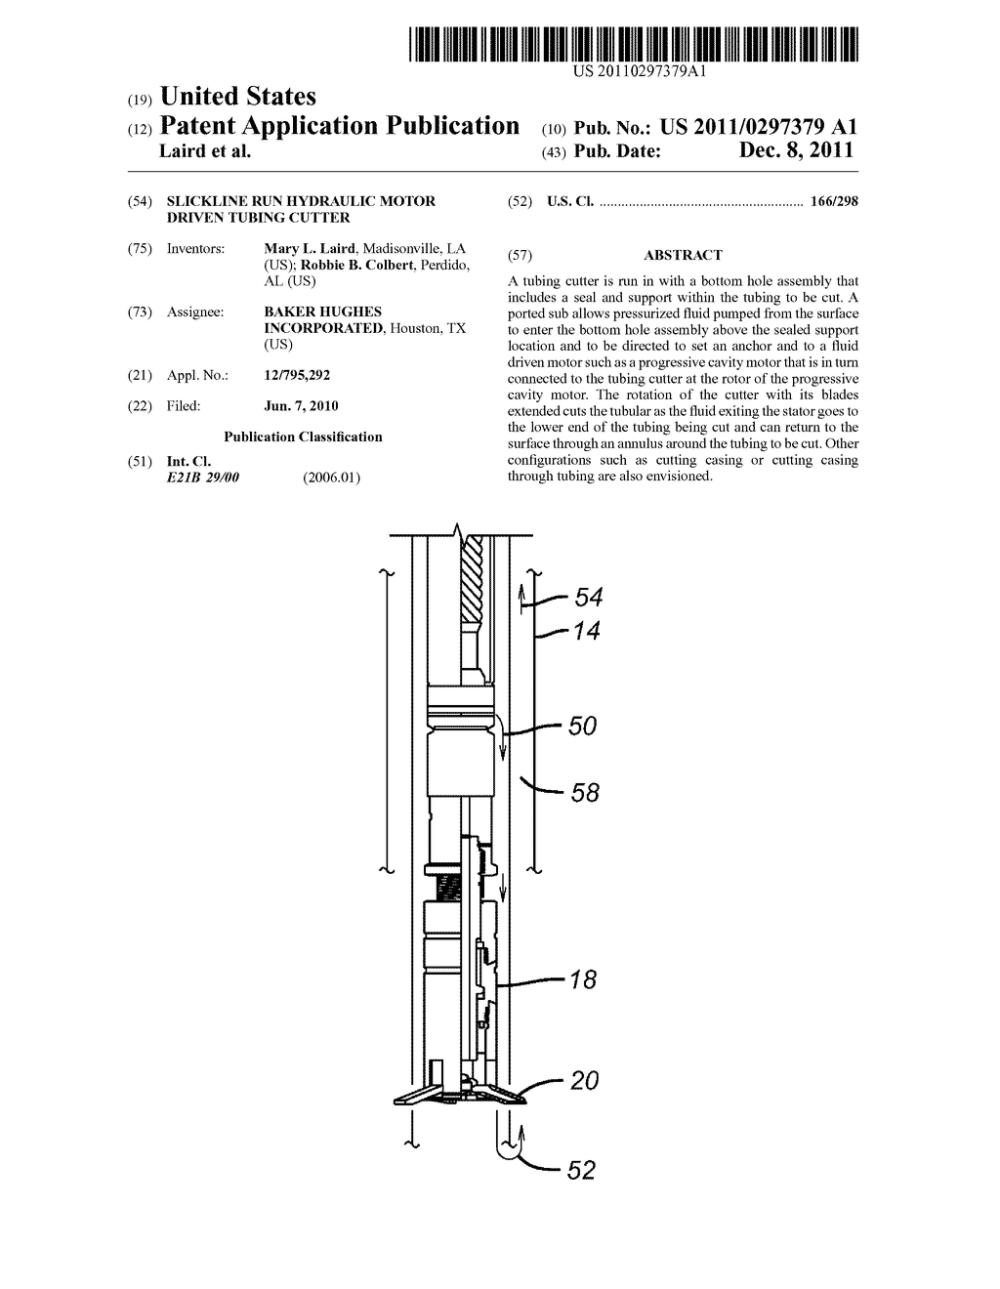 medium resolution of slickline run hydraulic motor driven tubing cutter diagram time delay relay wiring diagram circuit diagram hydraulic cutter